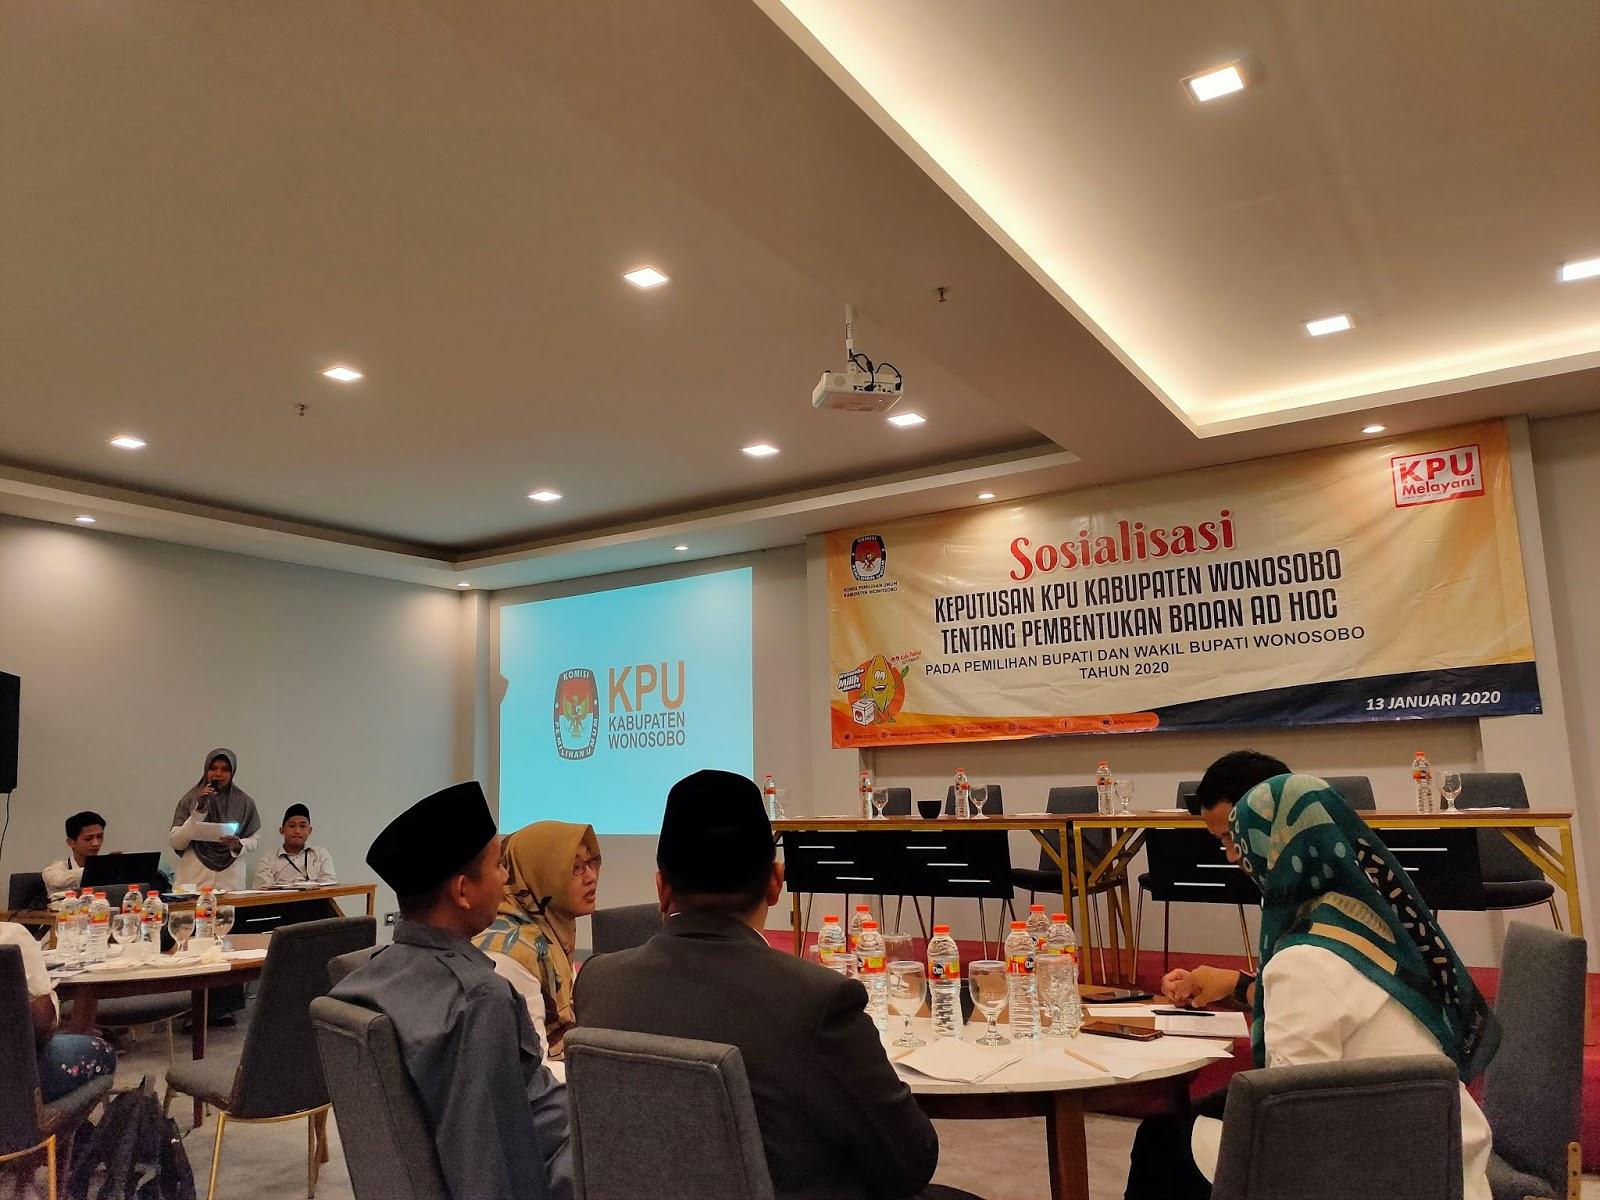 Rekrutmen PPK (Panitia Pemilihan Kecamatan) Pilbup 2020 Wonosobo